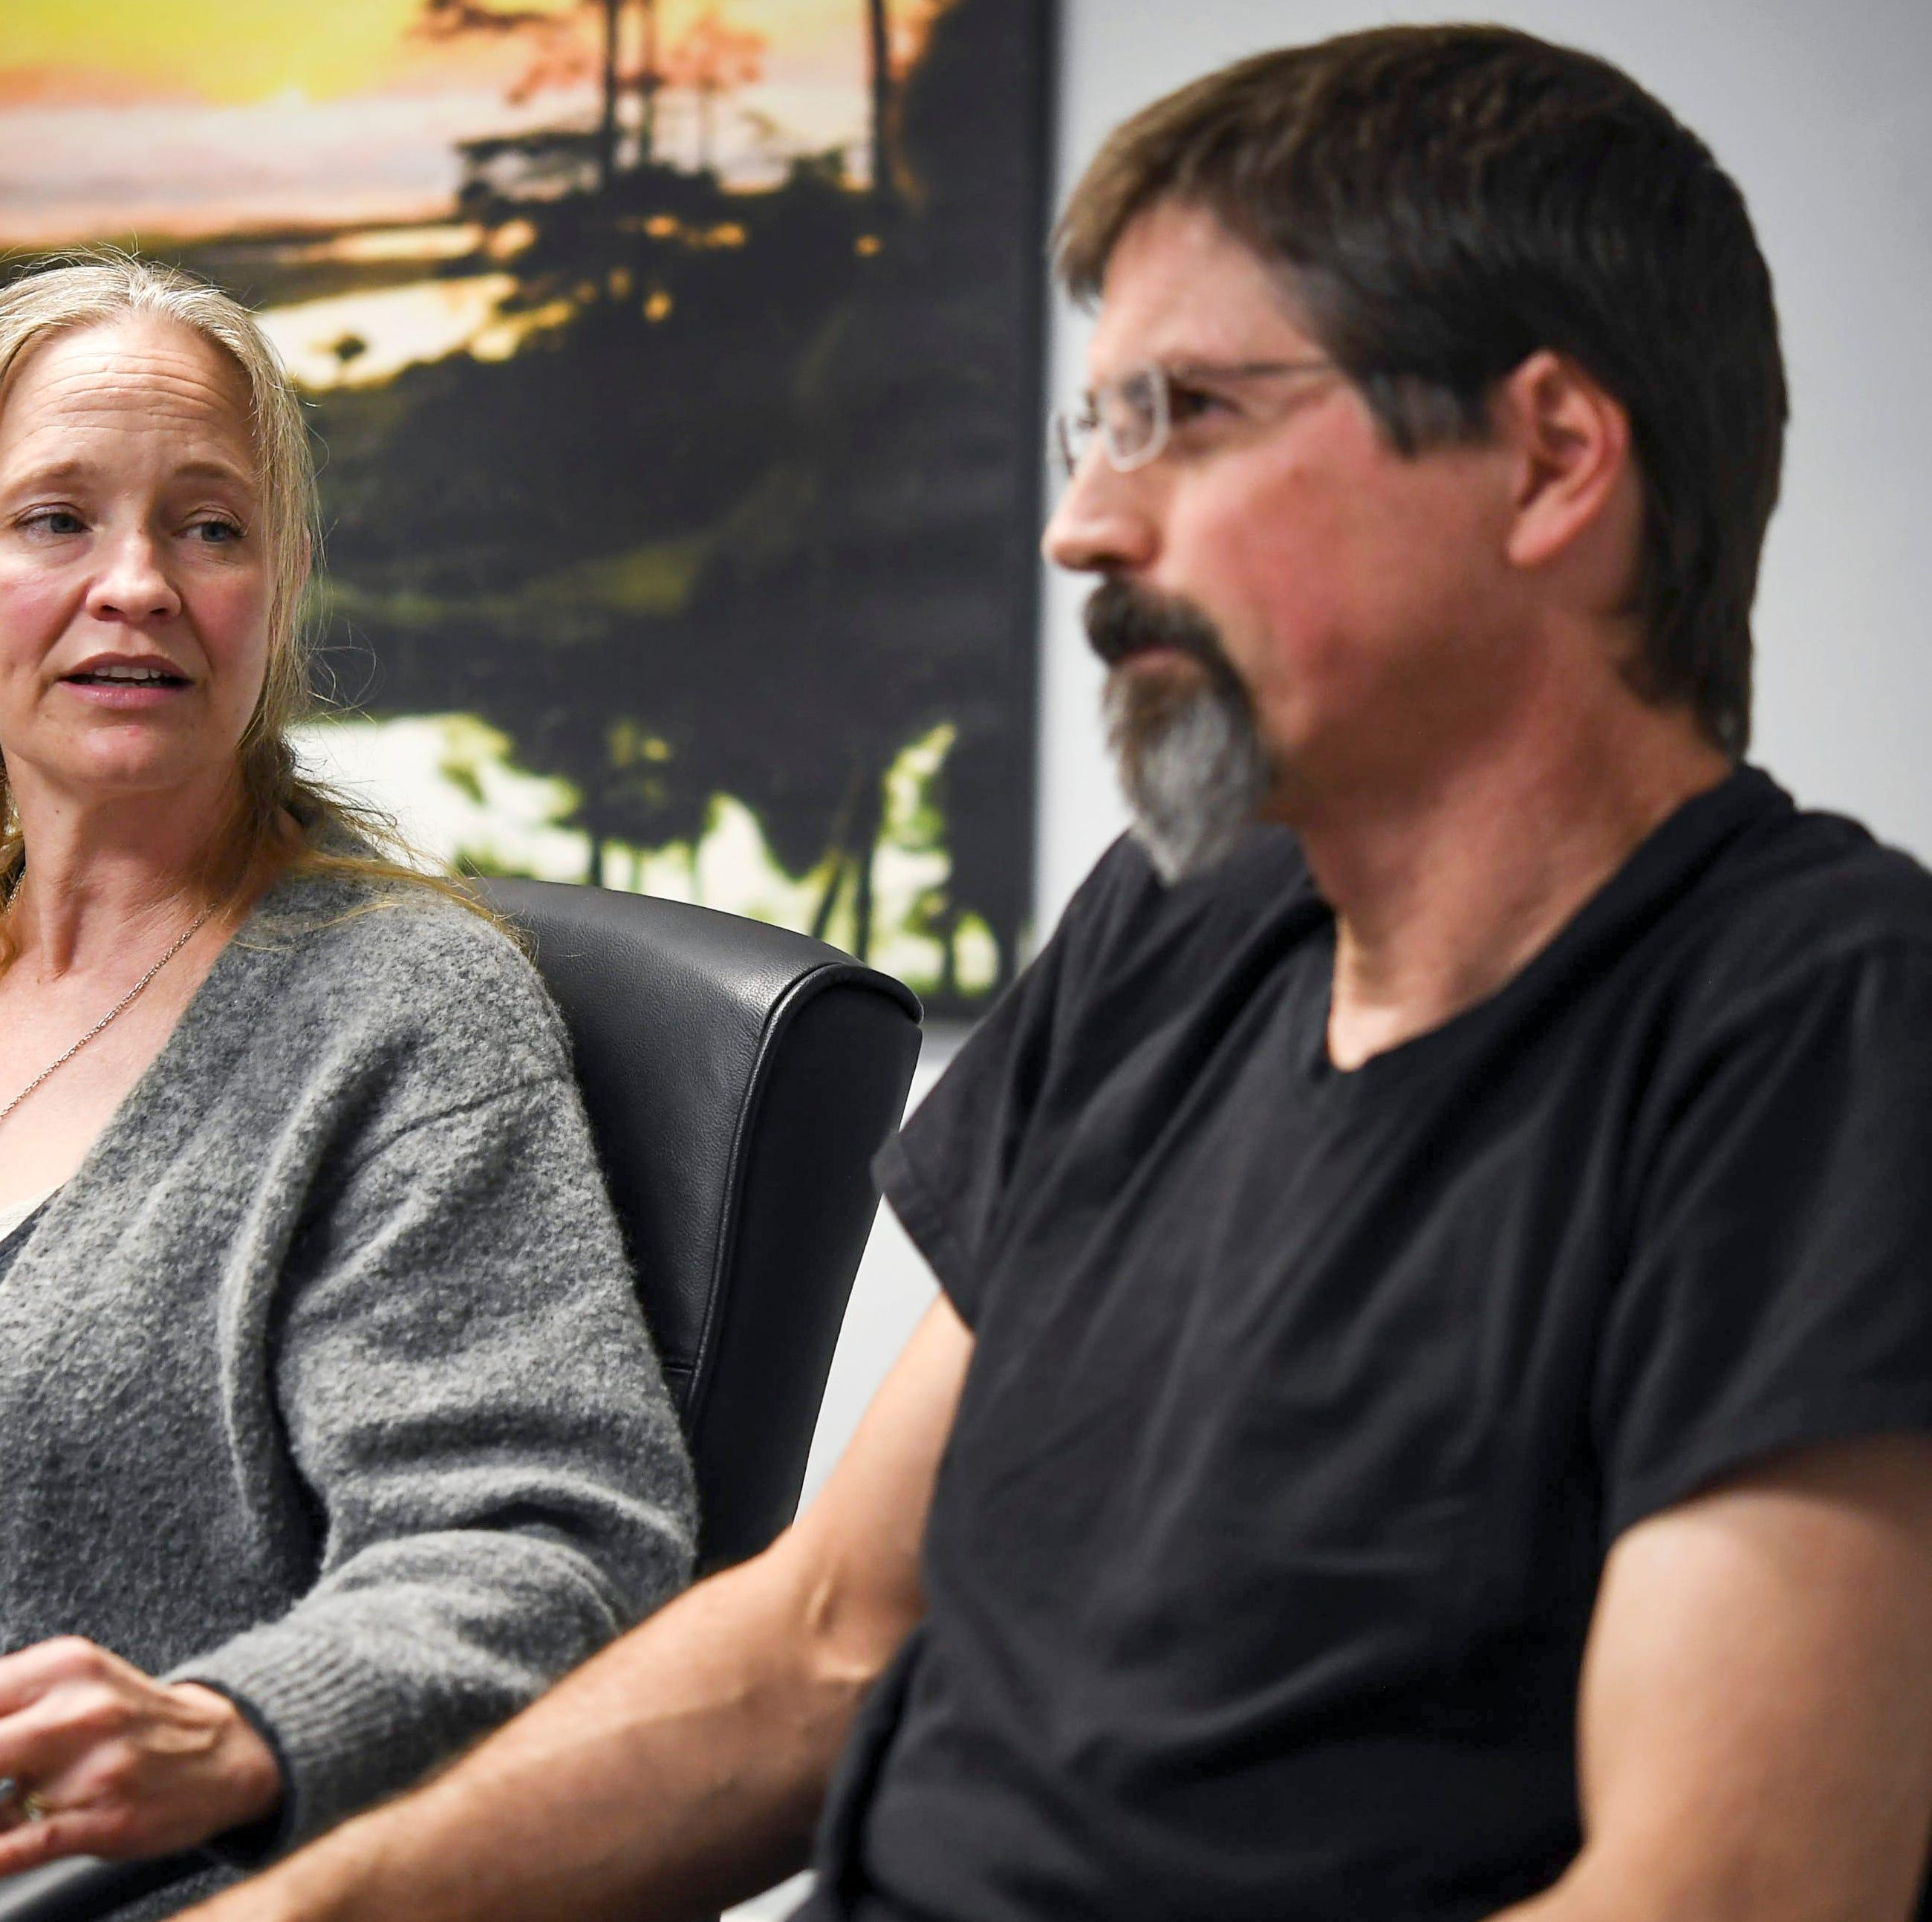 Shelley Baldwin says schools, legal system failed her in Bill Murdock case